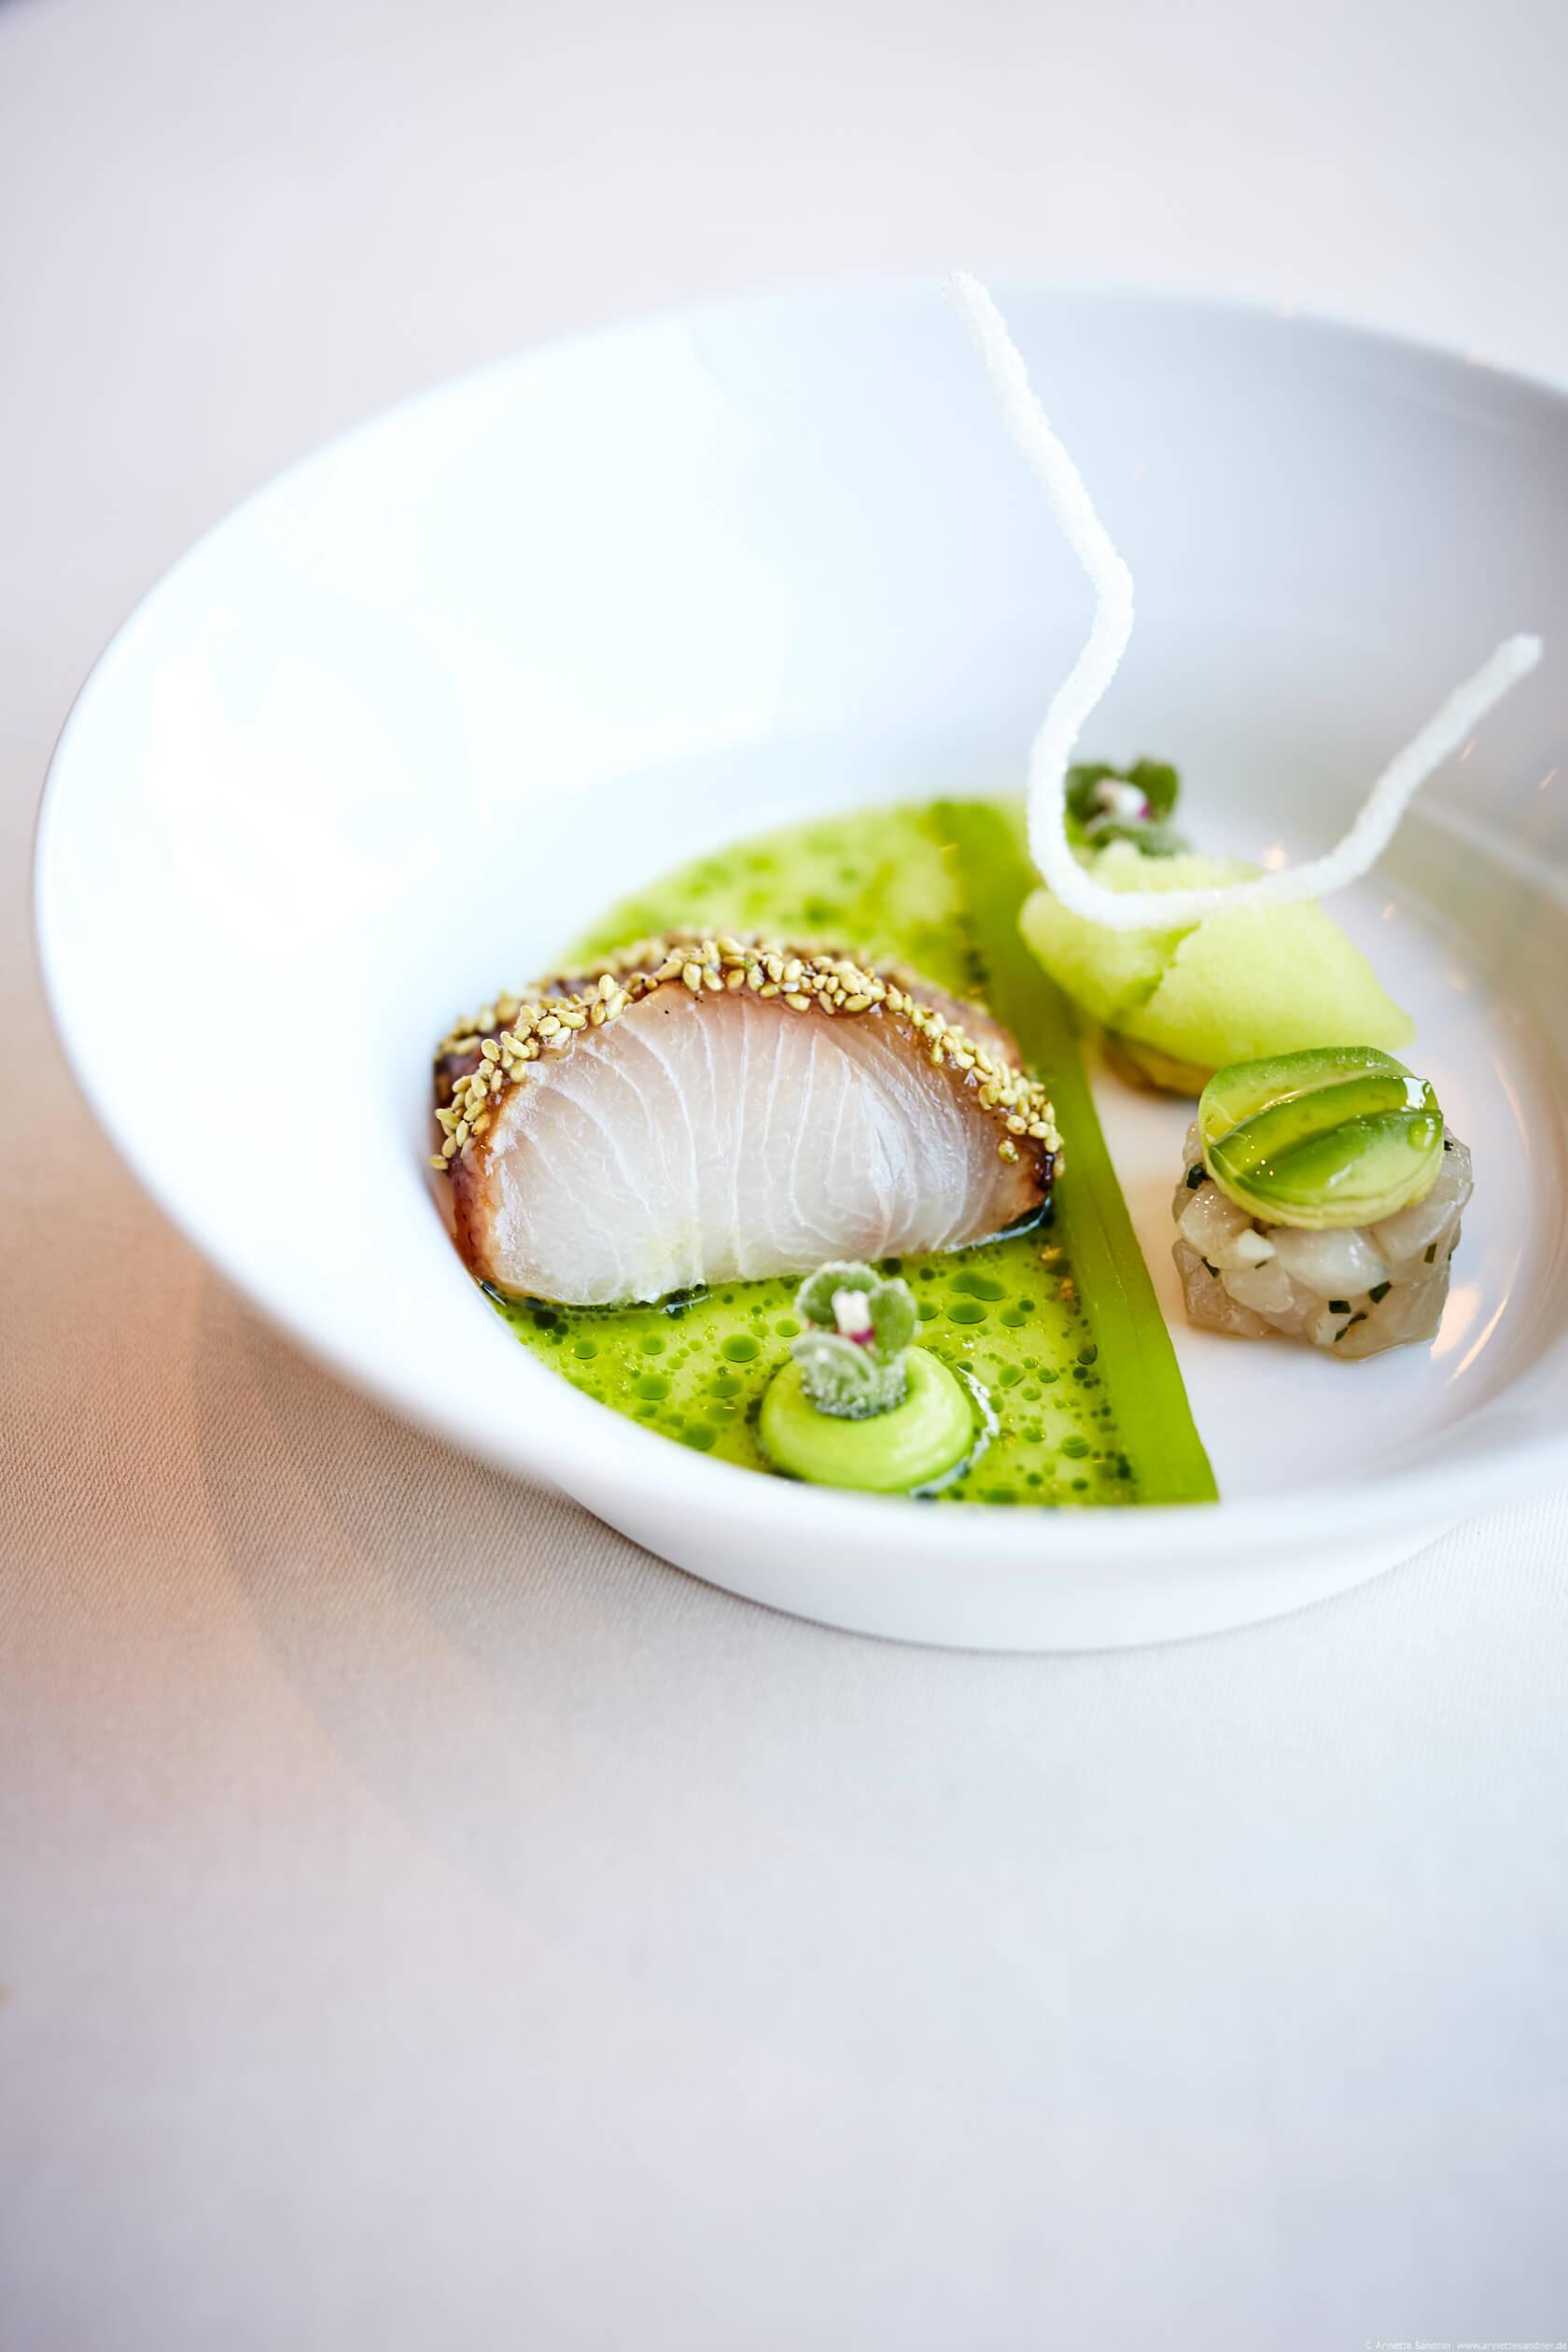 Geflämmter Hamachi Wasabi, Avocado, Gurke, Gourmet Restaurant Olivo, Stuttgart, Anton Gschwendtner